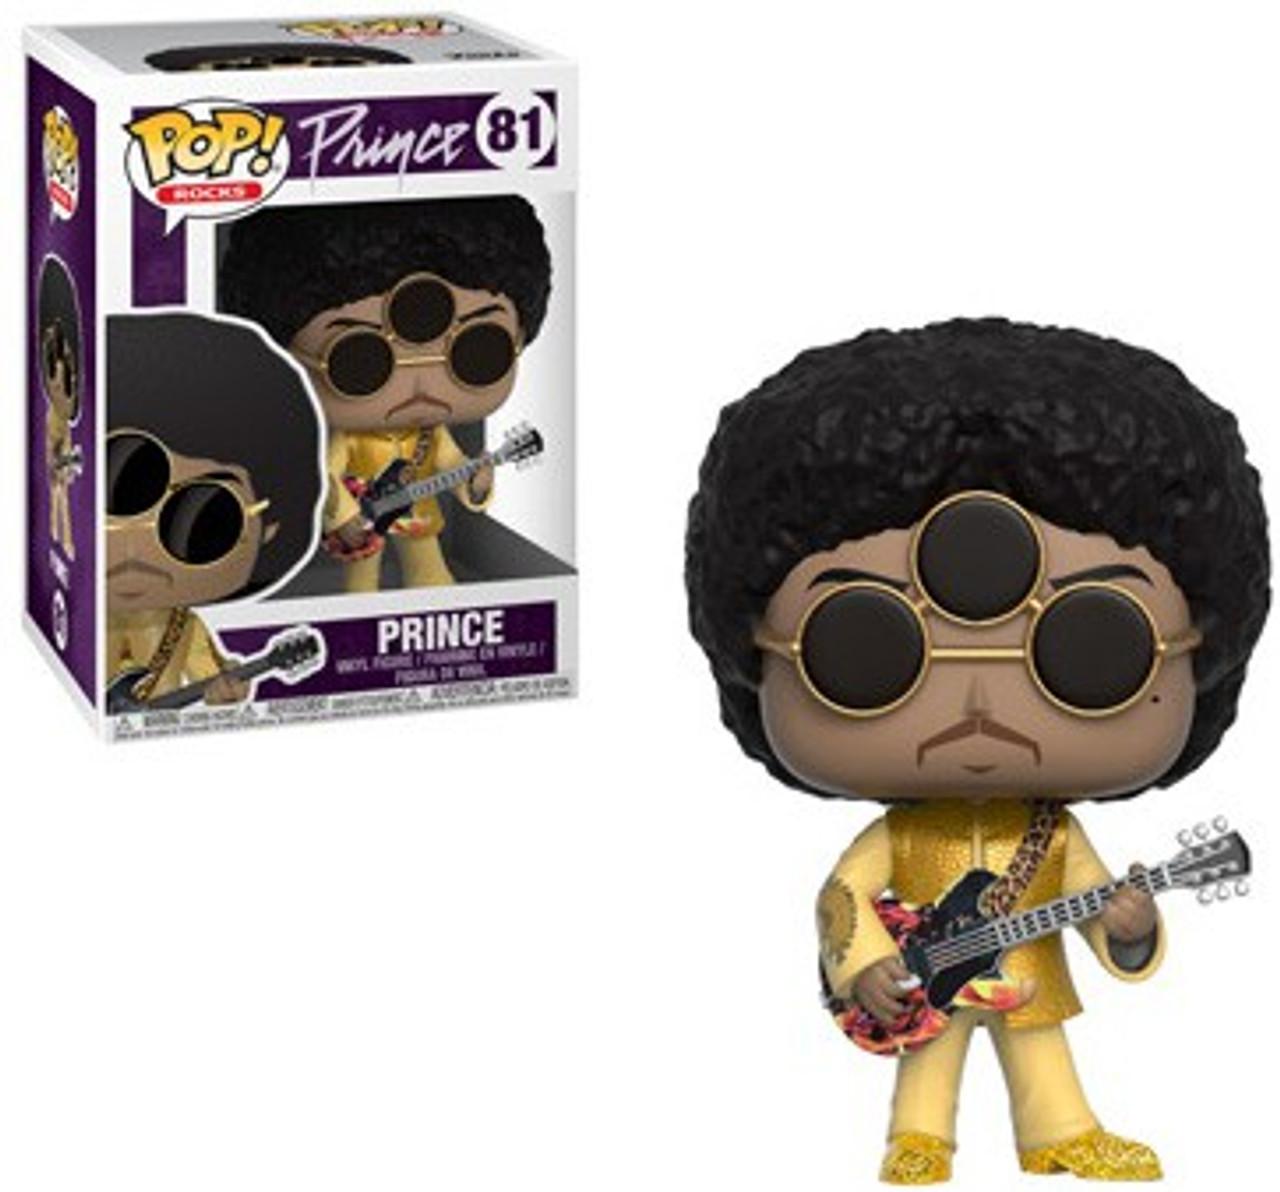 e34281b2159 Funko Prince Funko POP Rocks Prince Vinyl Figure 81 3rd Eye Girl - ToyWiz